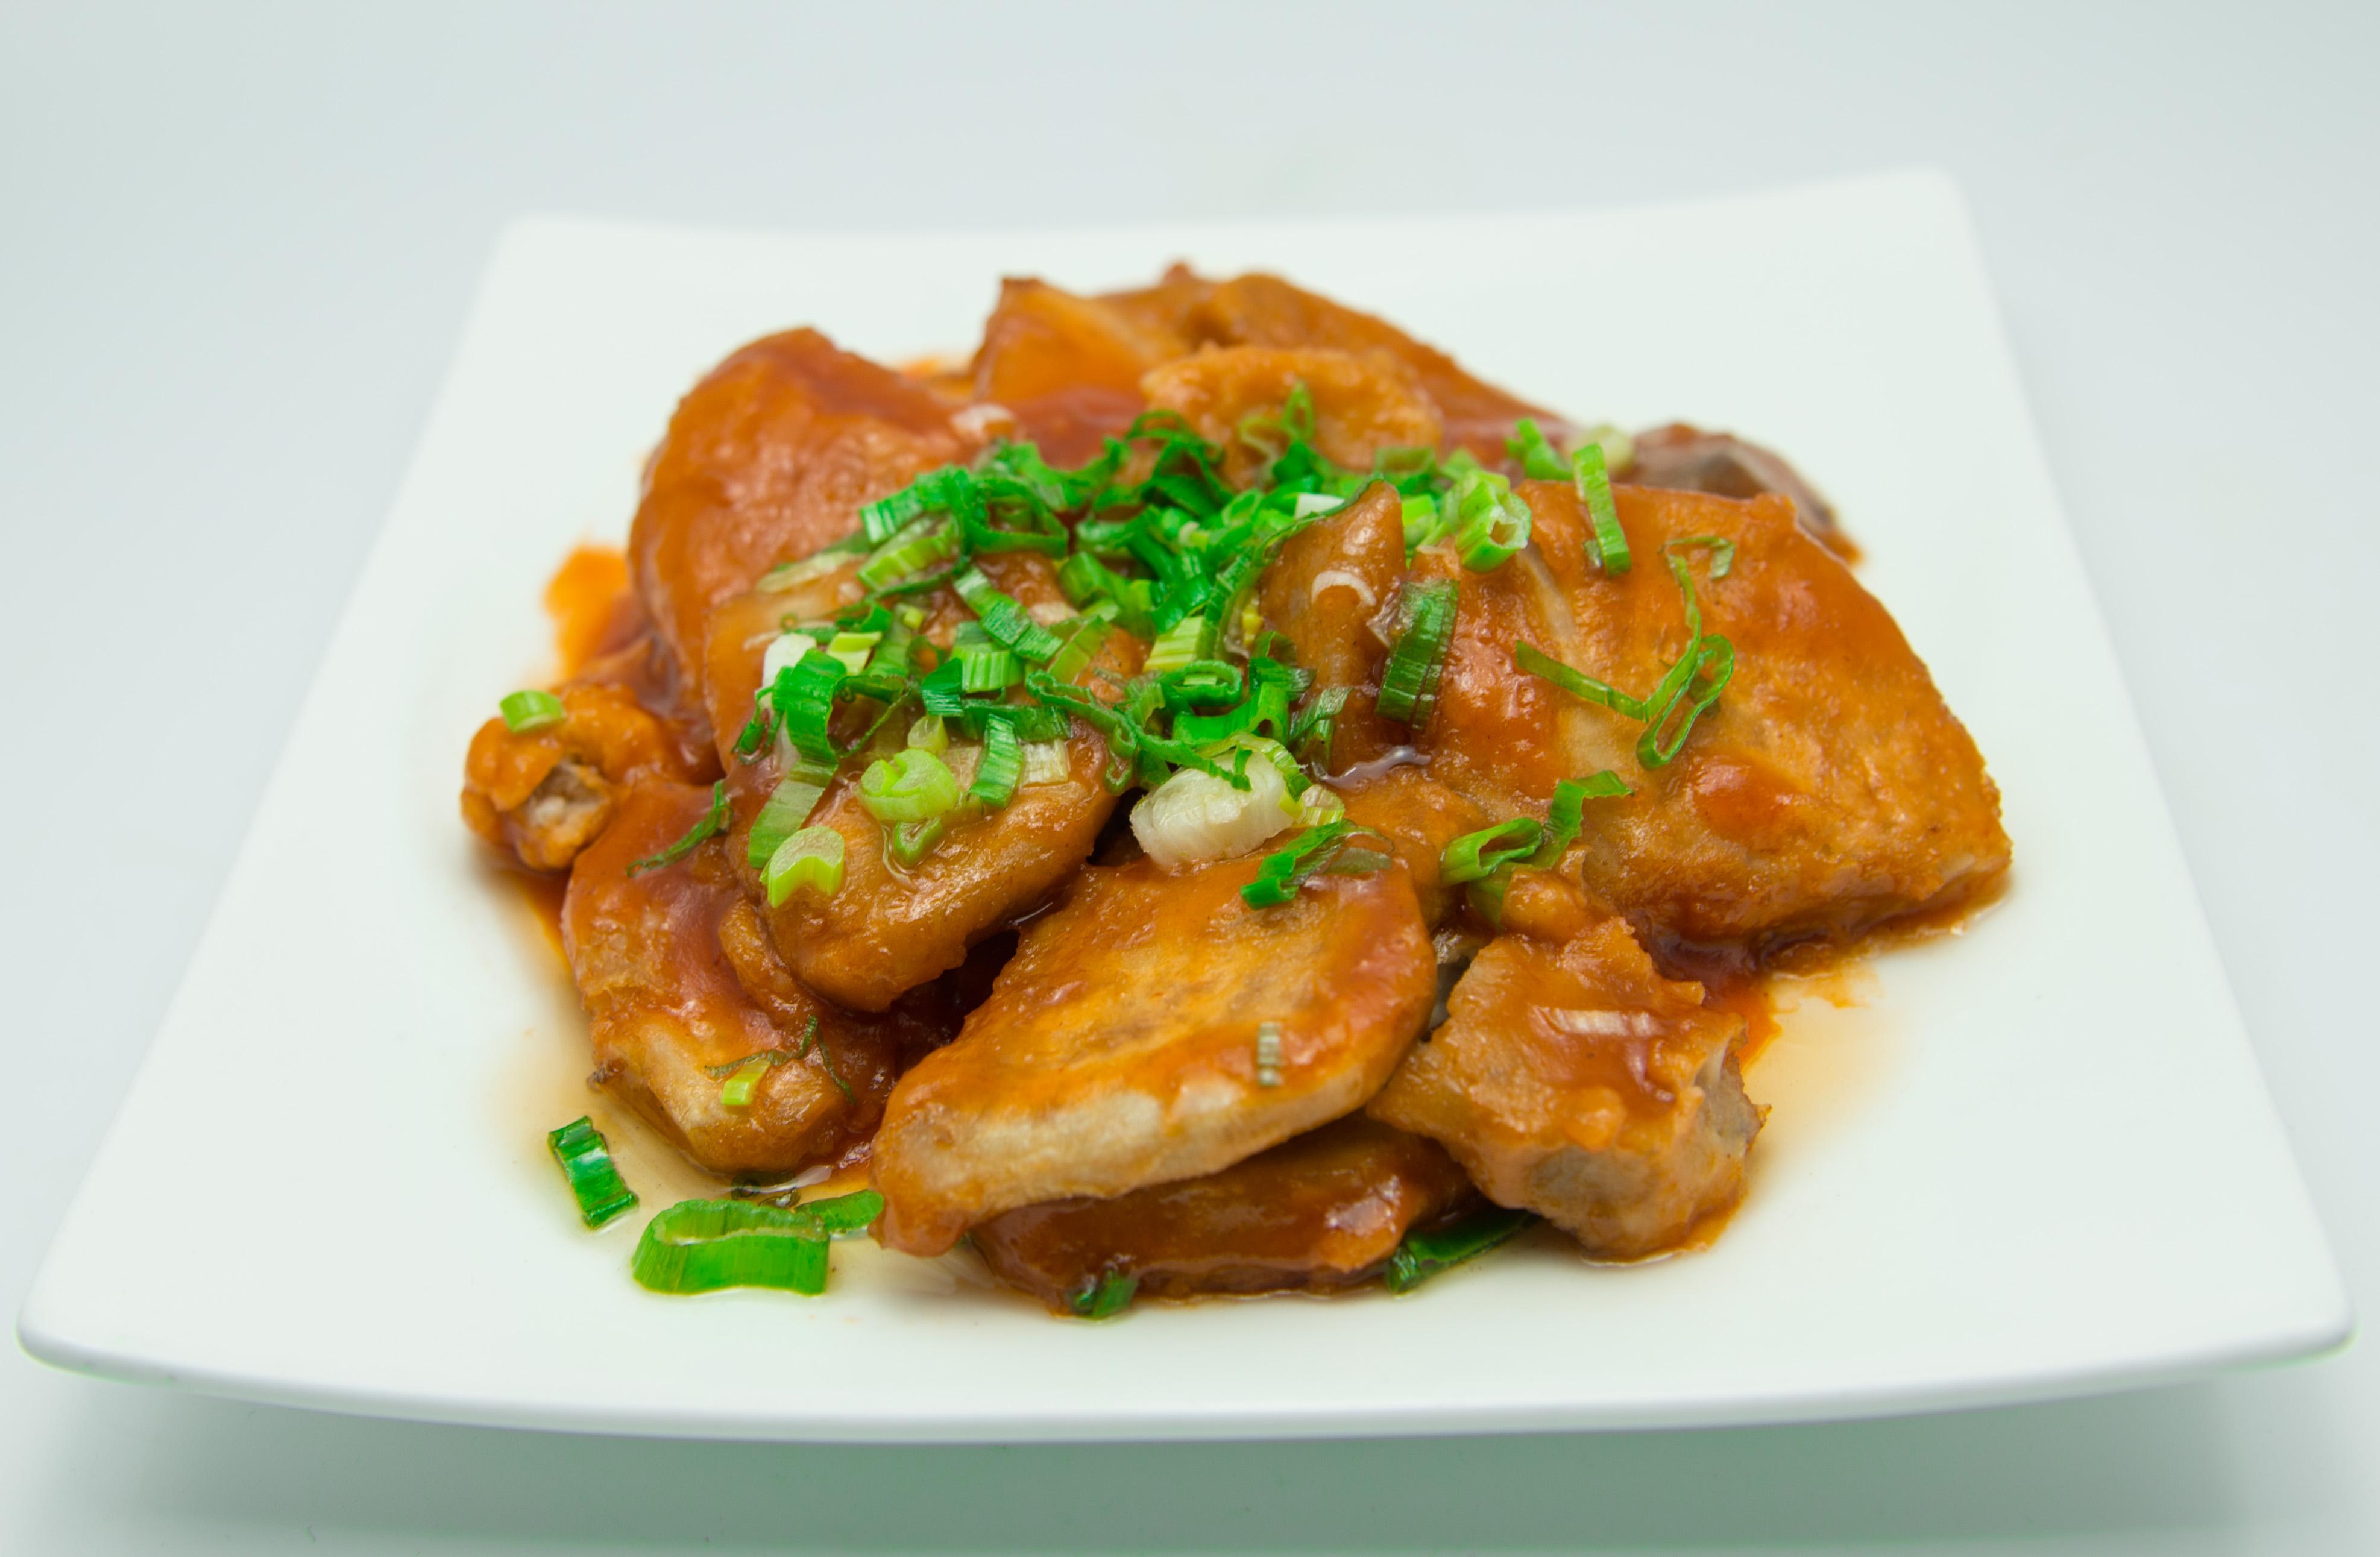 cartofi-chinezesti-cu-sos-dulce